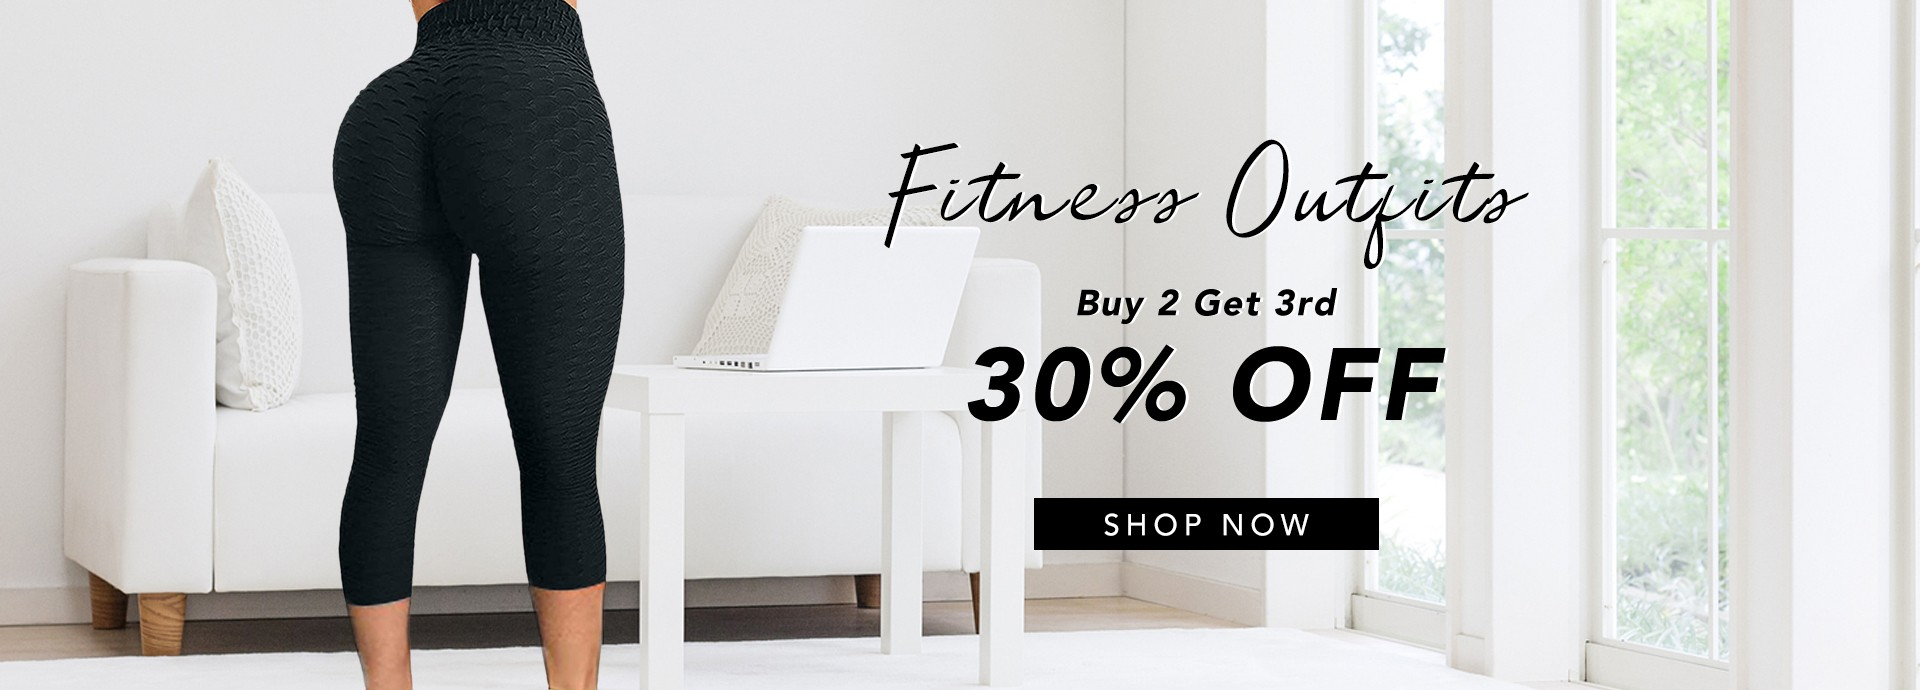 Fittness-Buy 2 Get 3rd 30% OFF